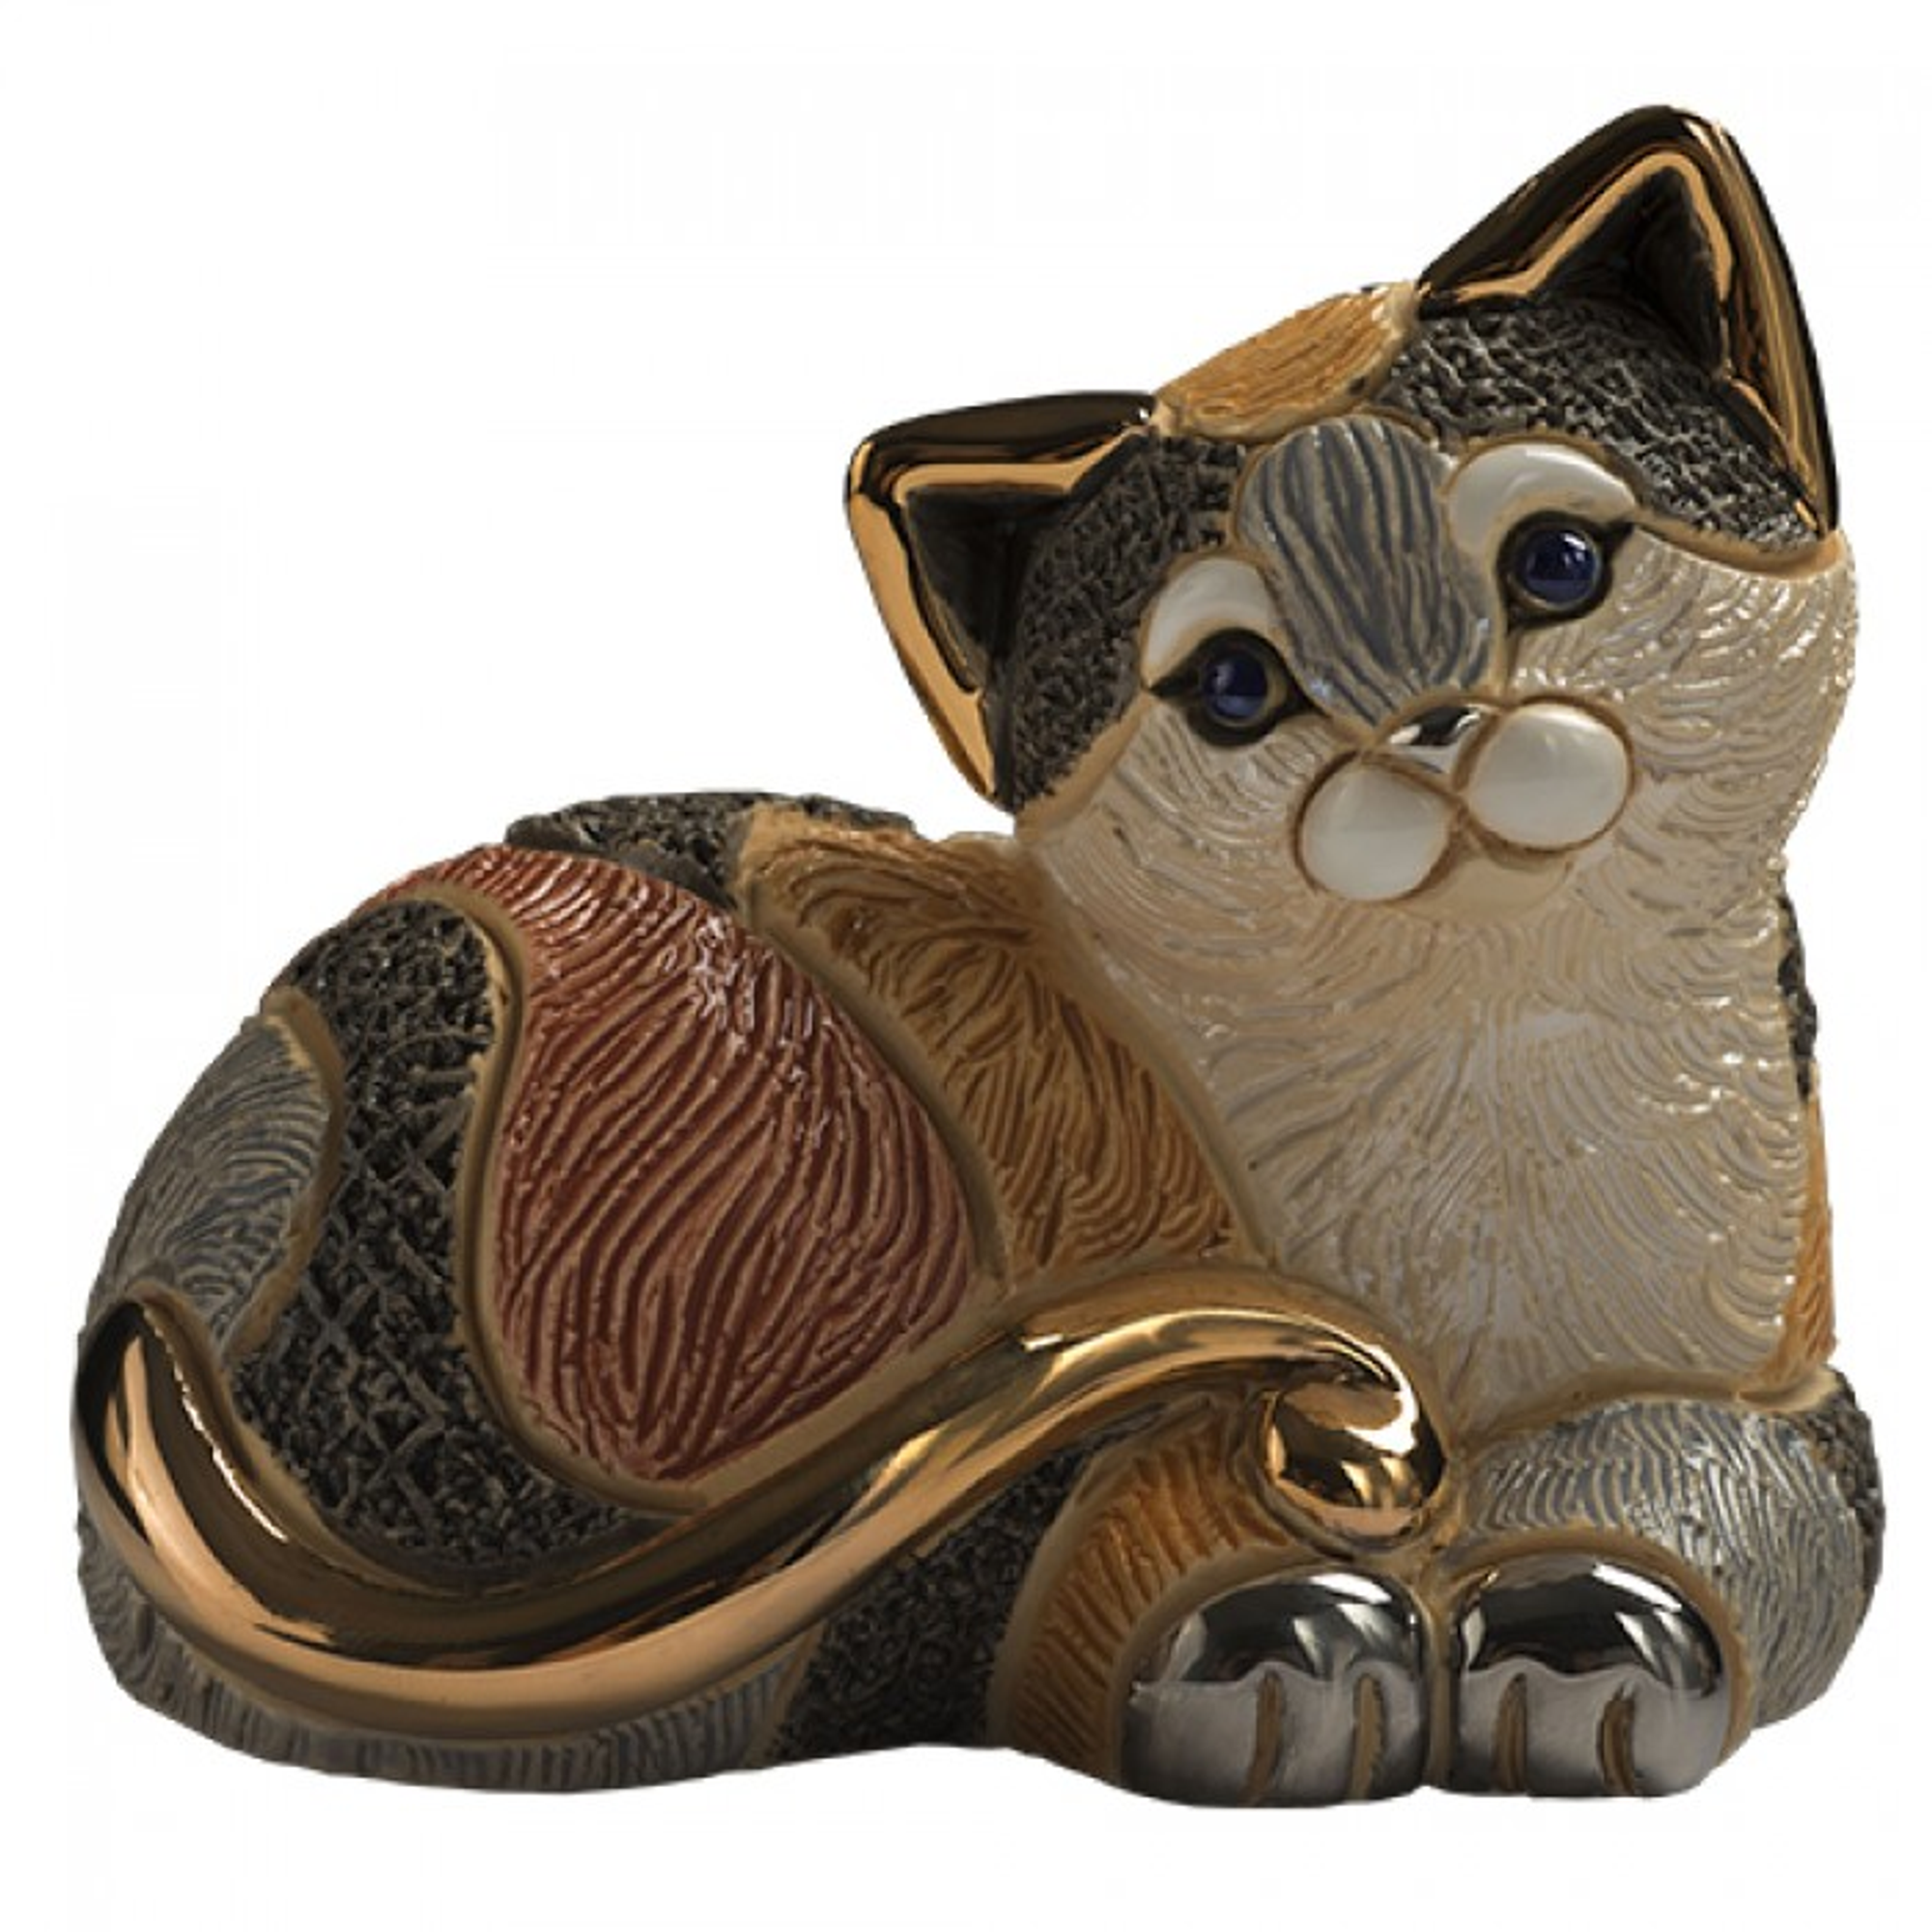 Abanico Cat Ceramic Figurine